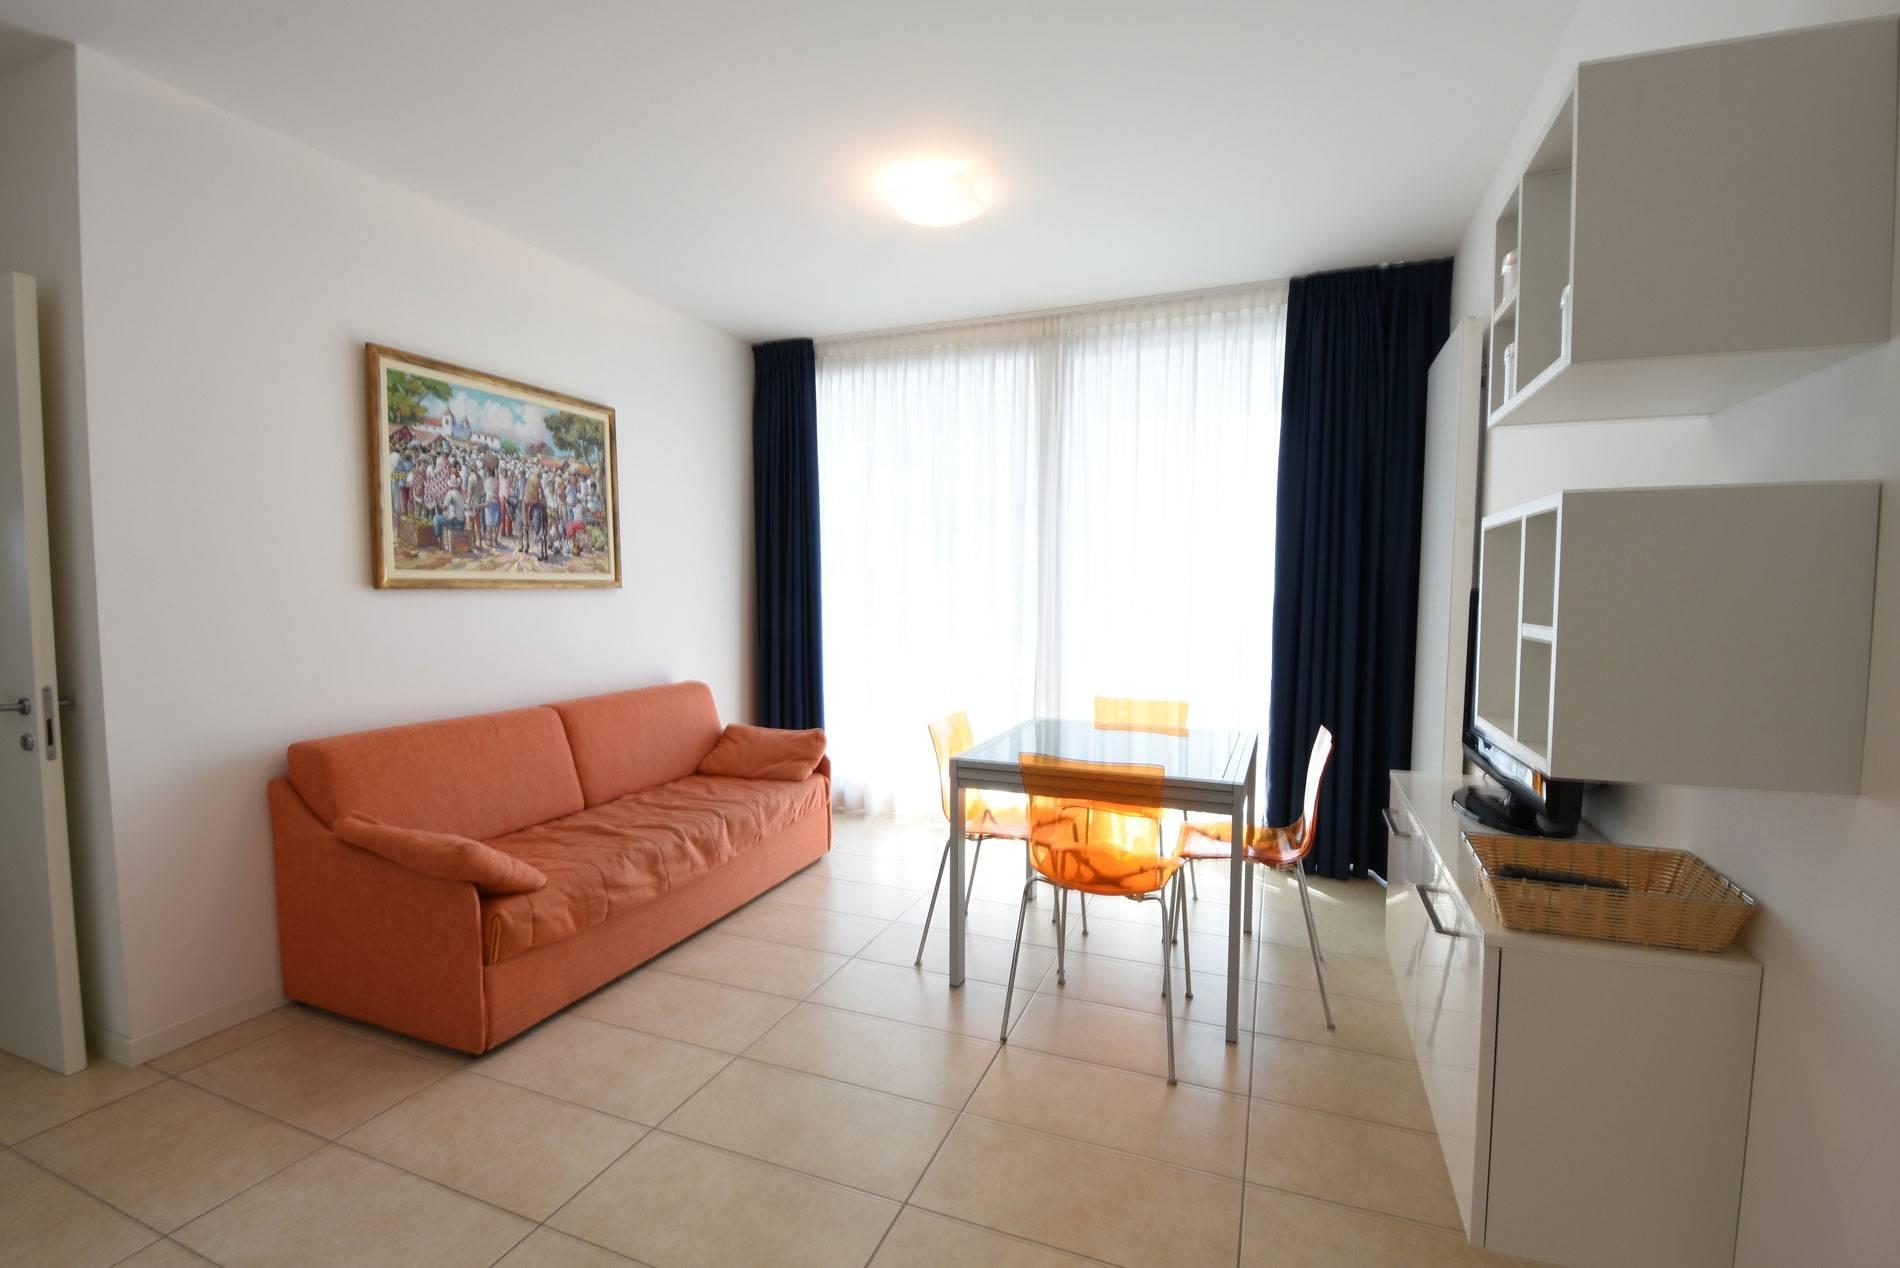 salotto-residence-belvedere-1613678845